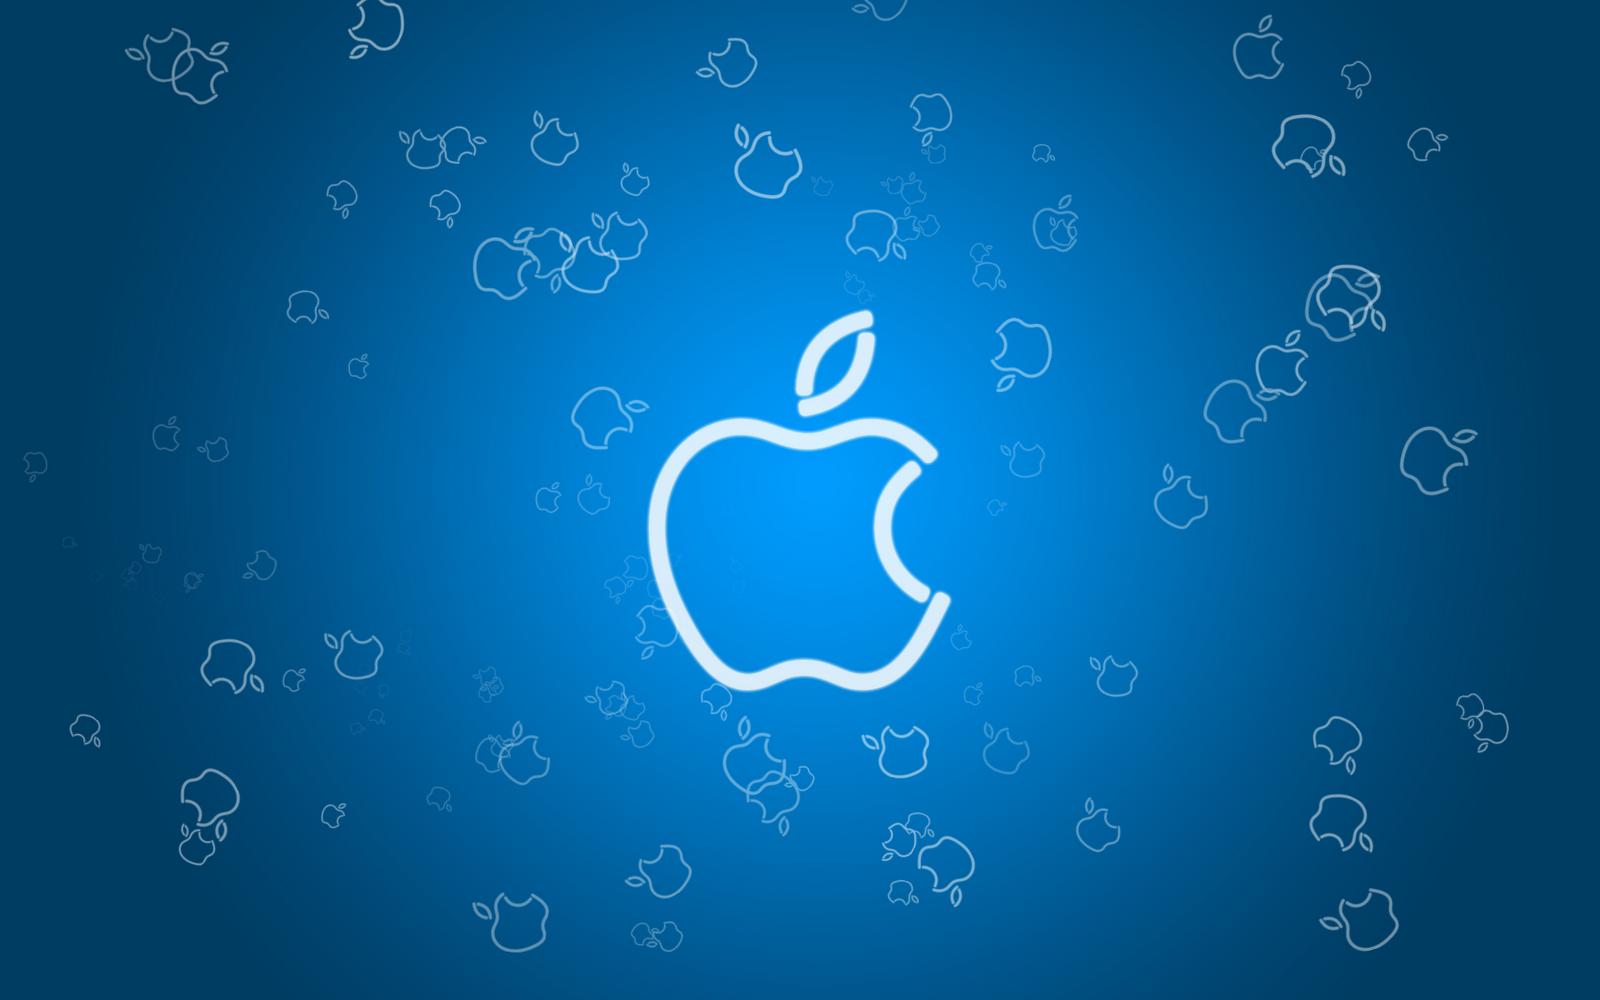 Cool Apple Logo Wallpaper